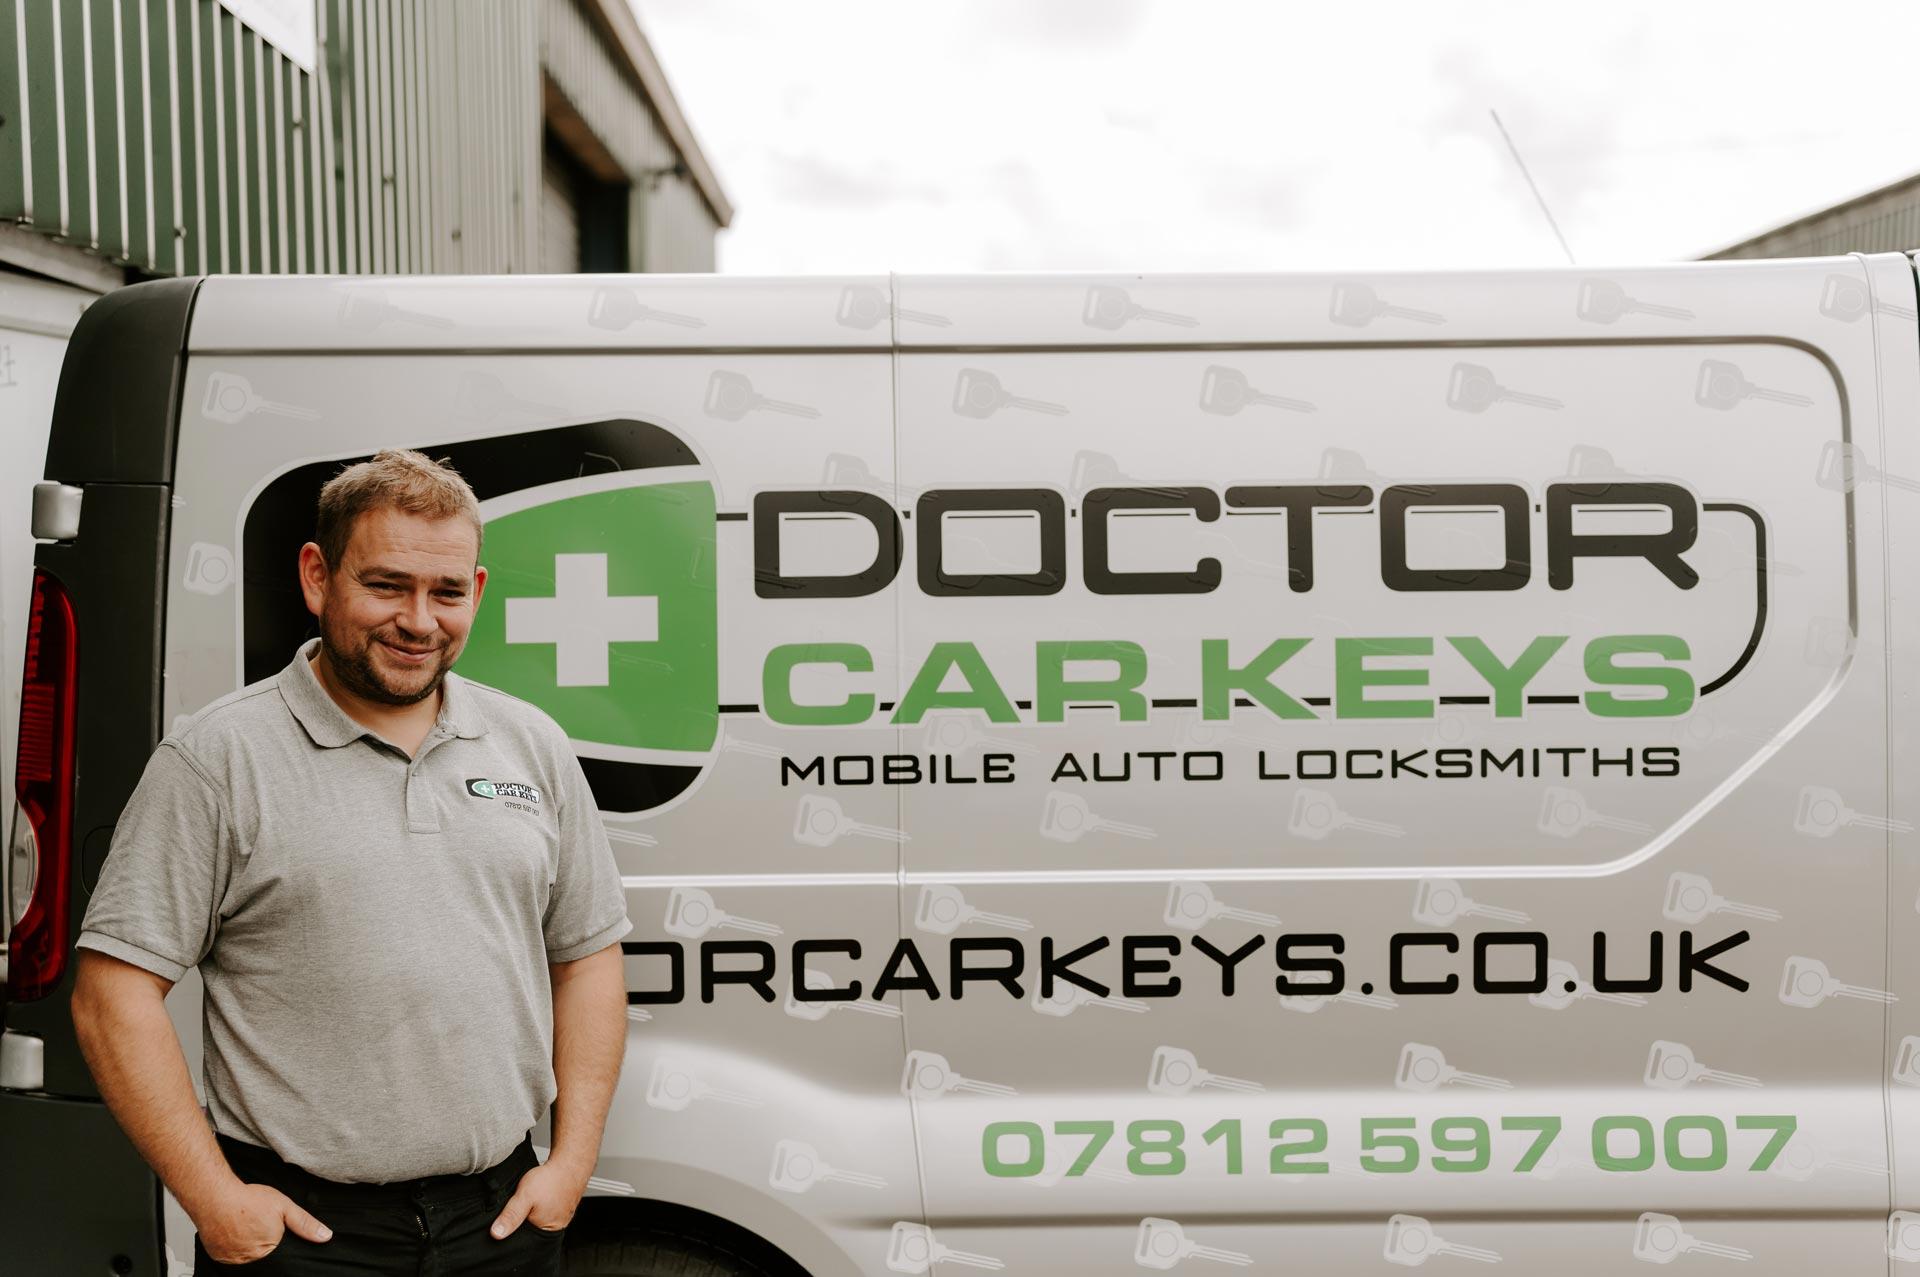 Auto Locksmiths in Basingstoke